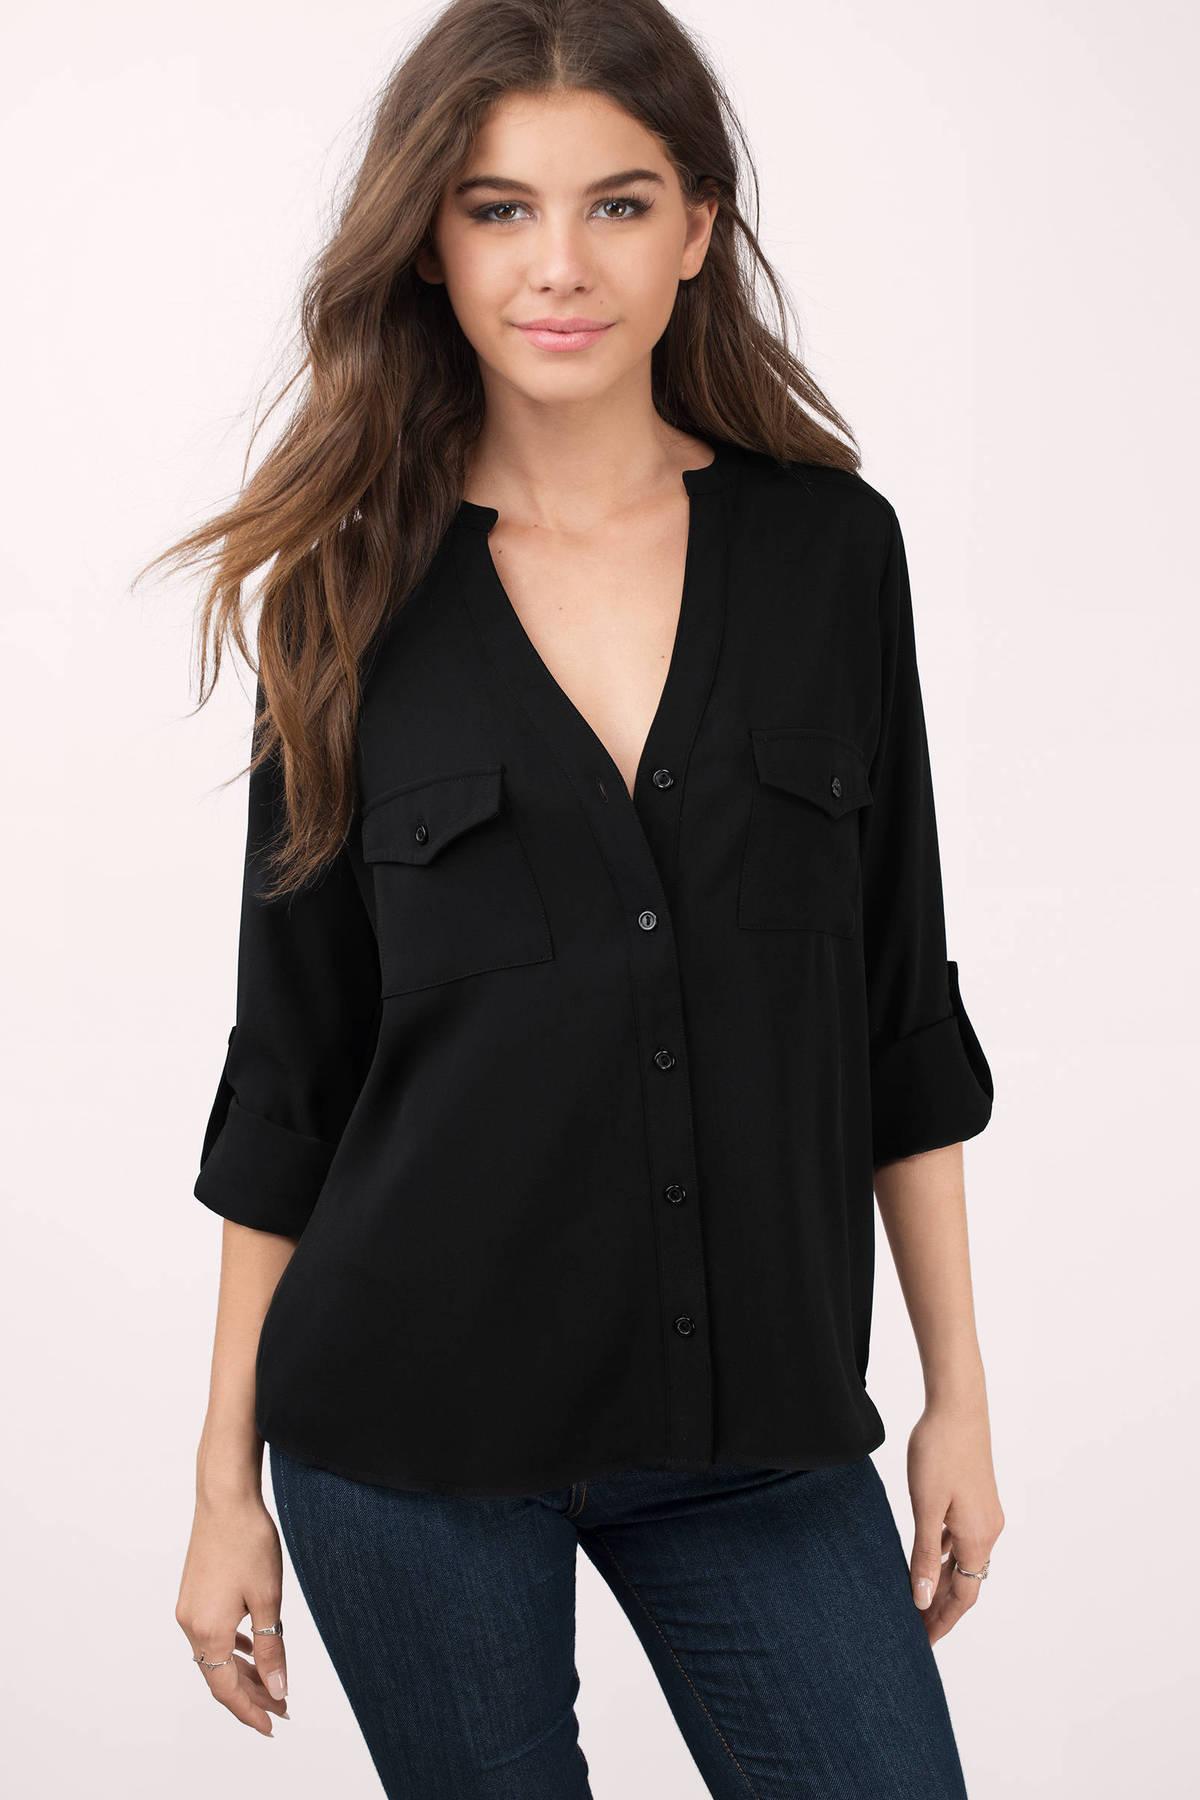 a8a672d53 Basic Black Shirt Tops Prettylittlething Prettylittlething Aus ...